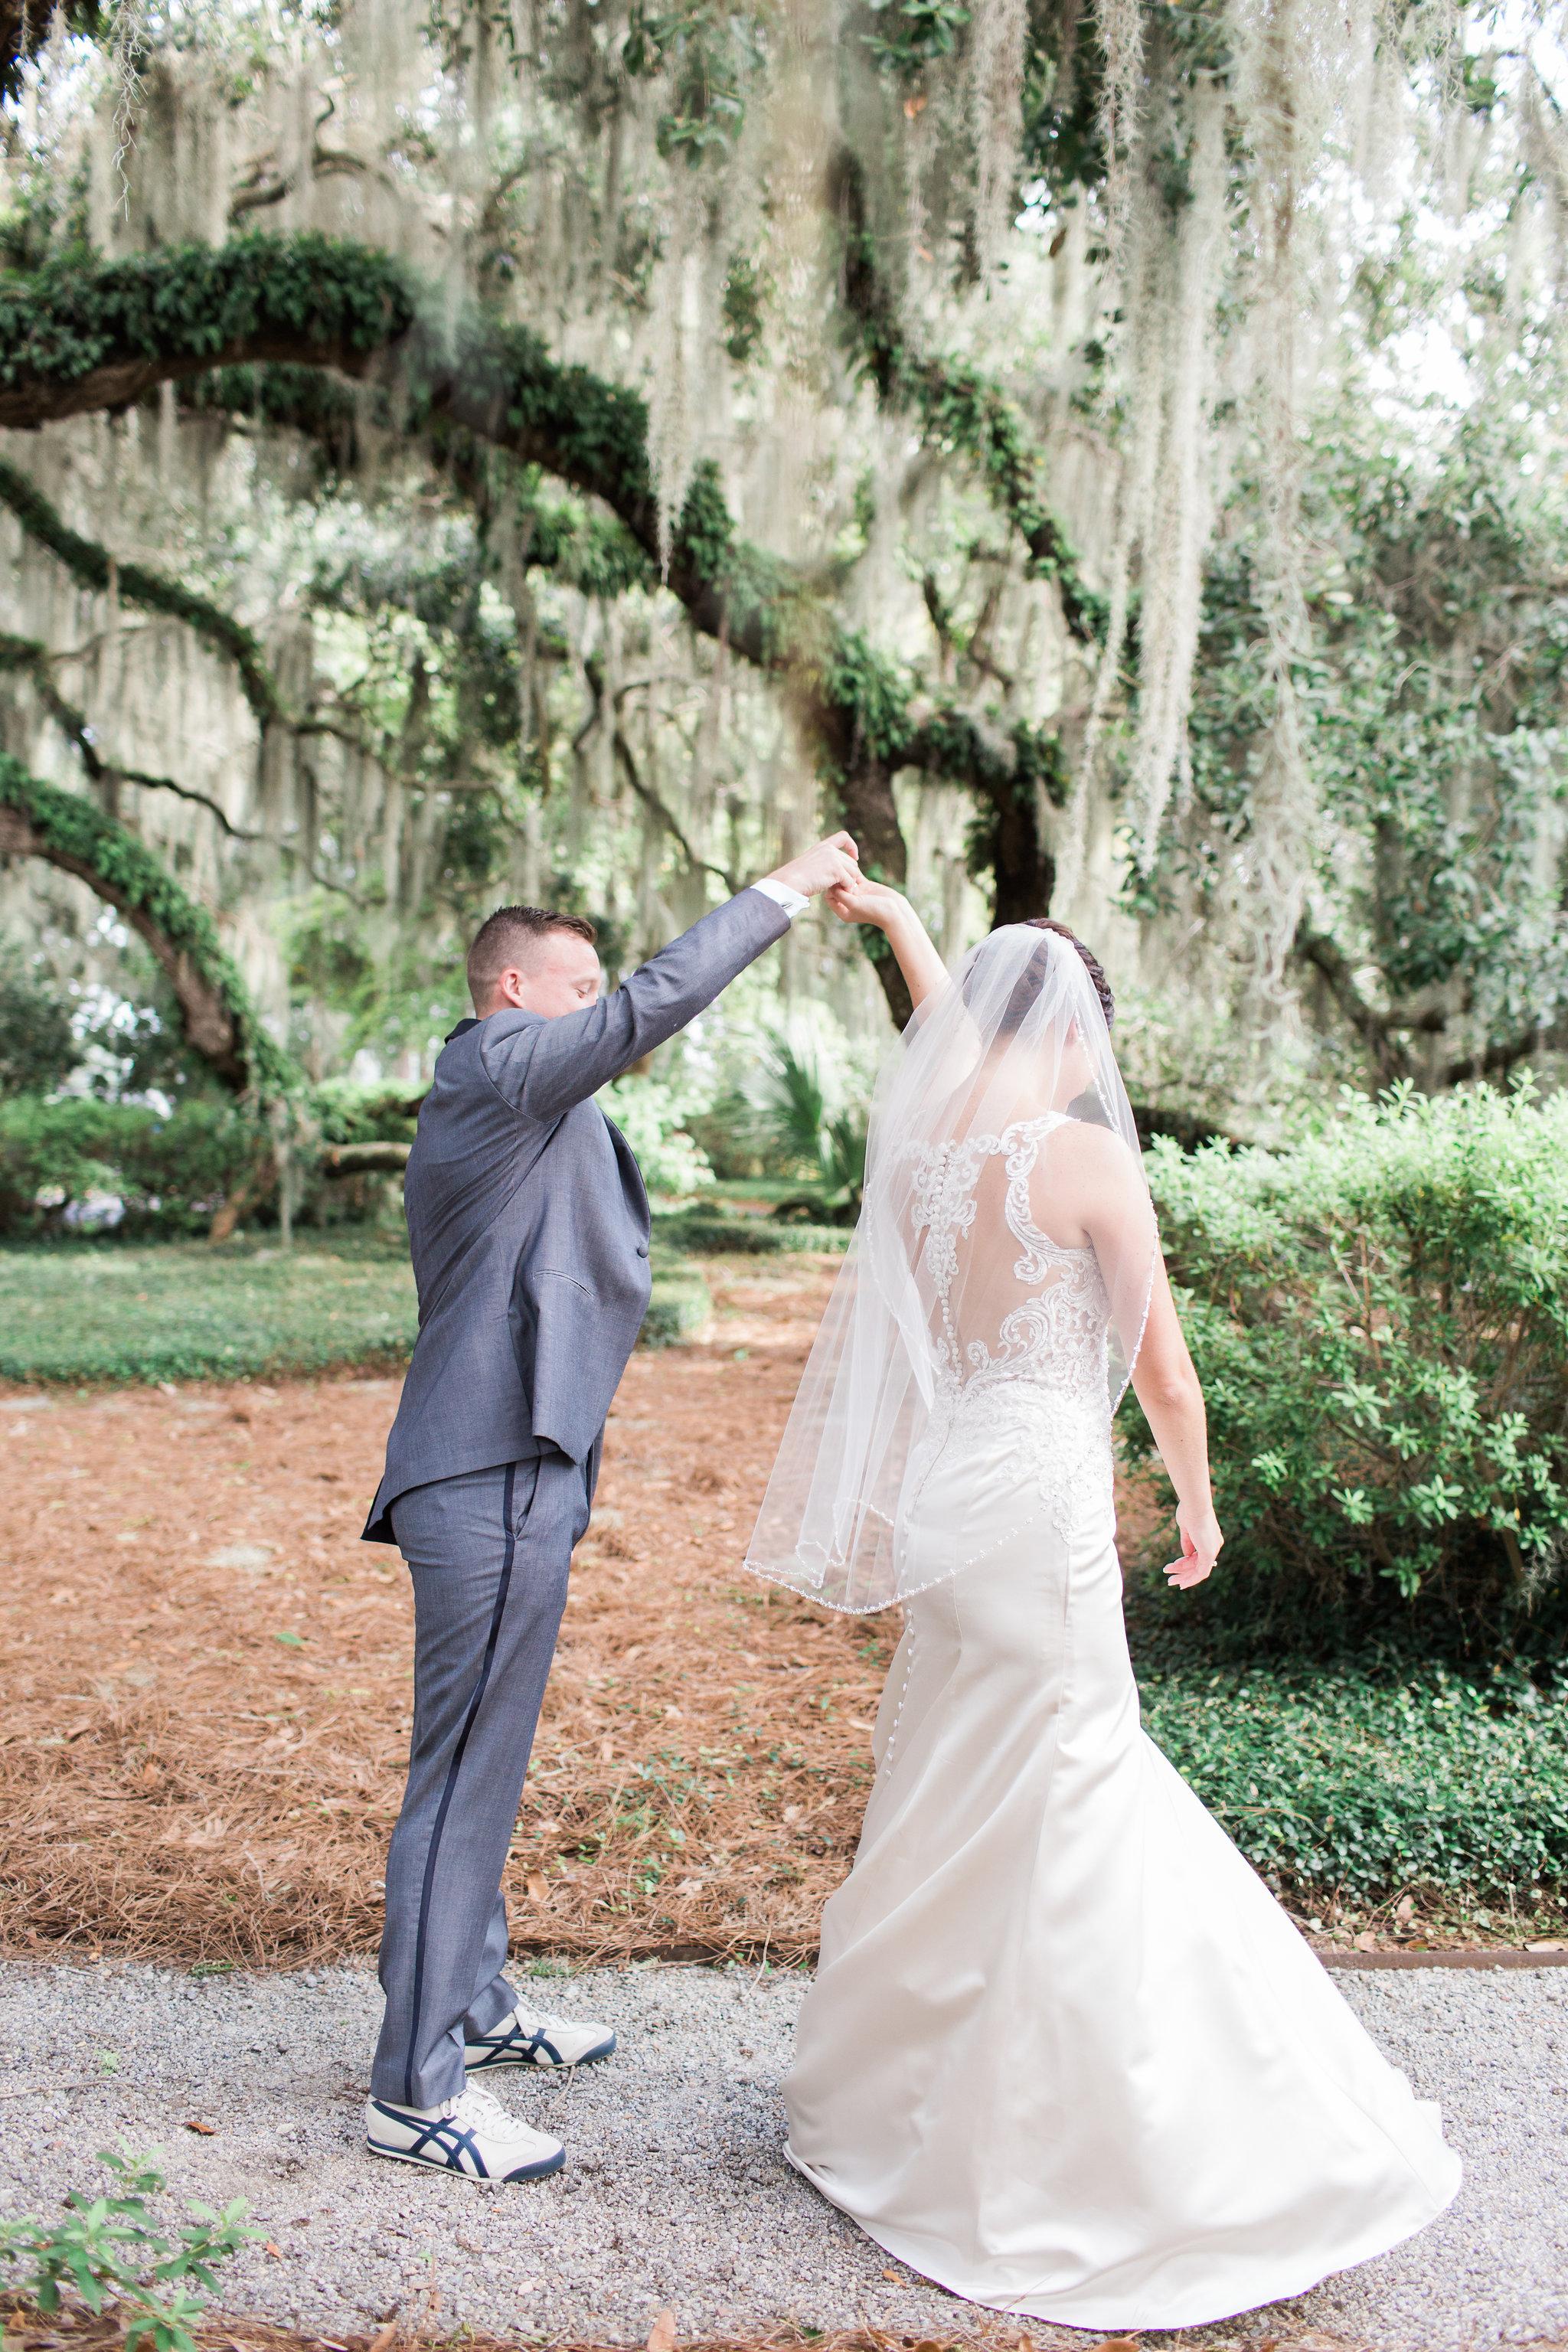 apt-b-photography-lauren-graham-oldfield-wedding-south-carolina-wedding-photographer-savannah-wedding-lowcountry-wedding-coastal-wedding-first-look-11.JPG